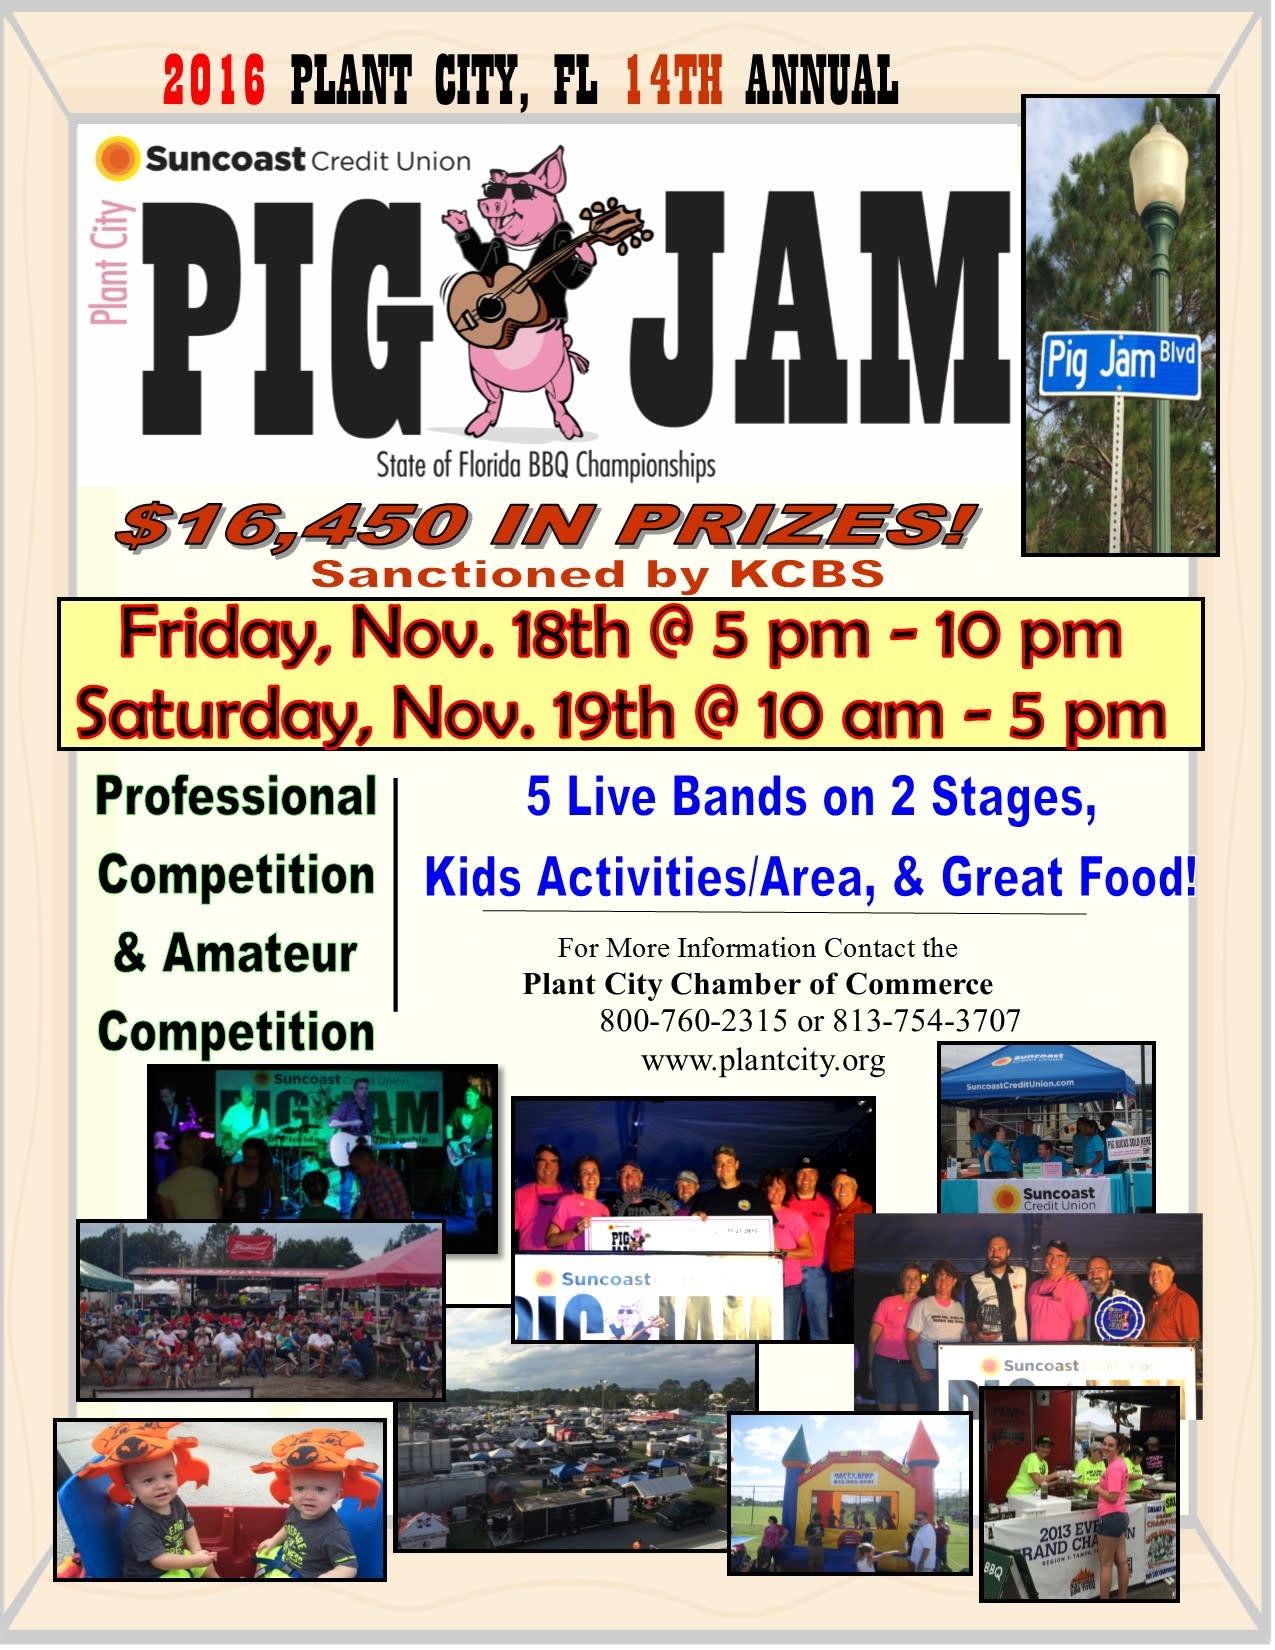 14th Annual Suncoast Credit Union Plant City Pig Jam